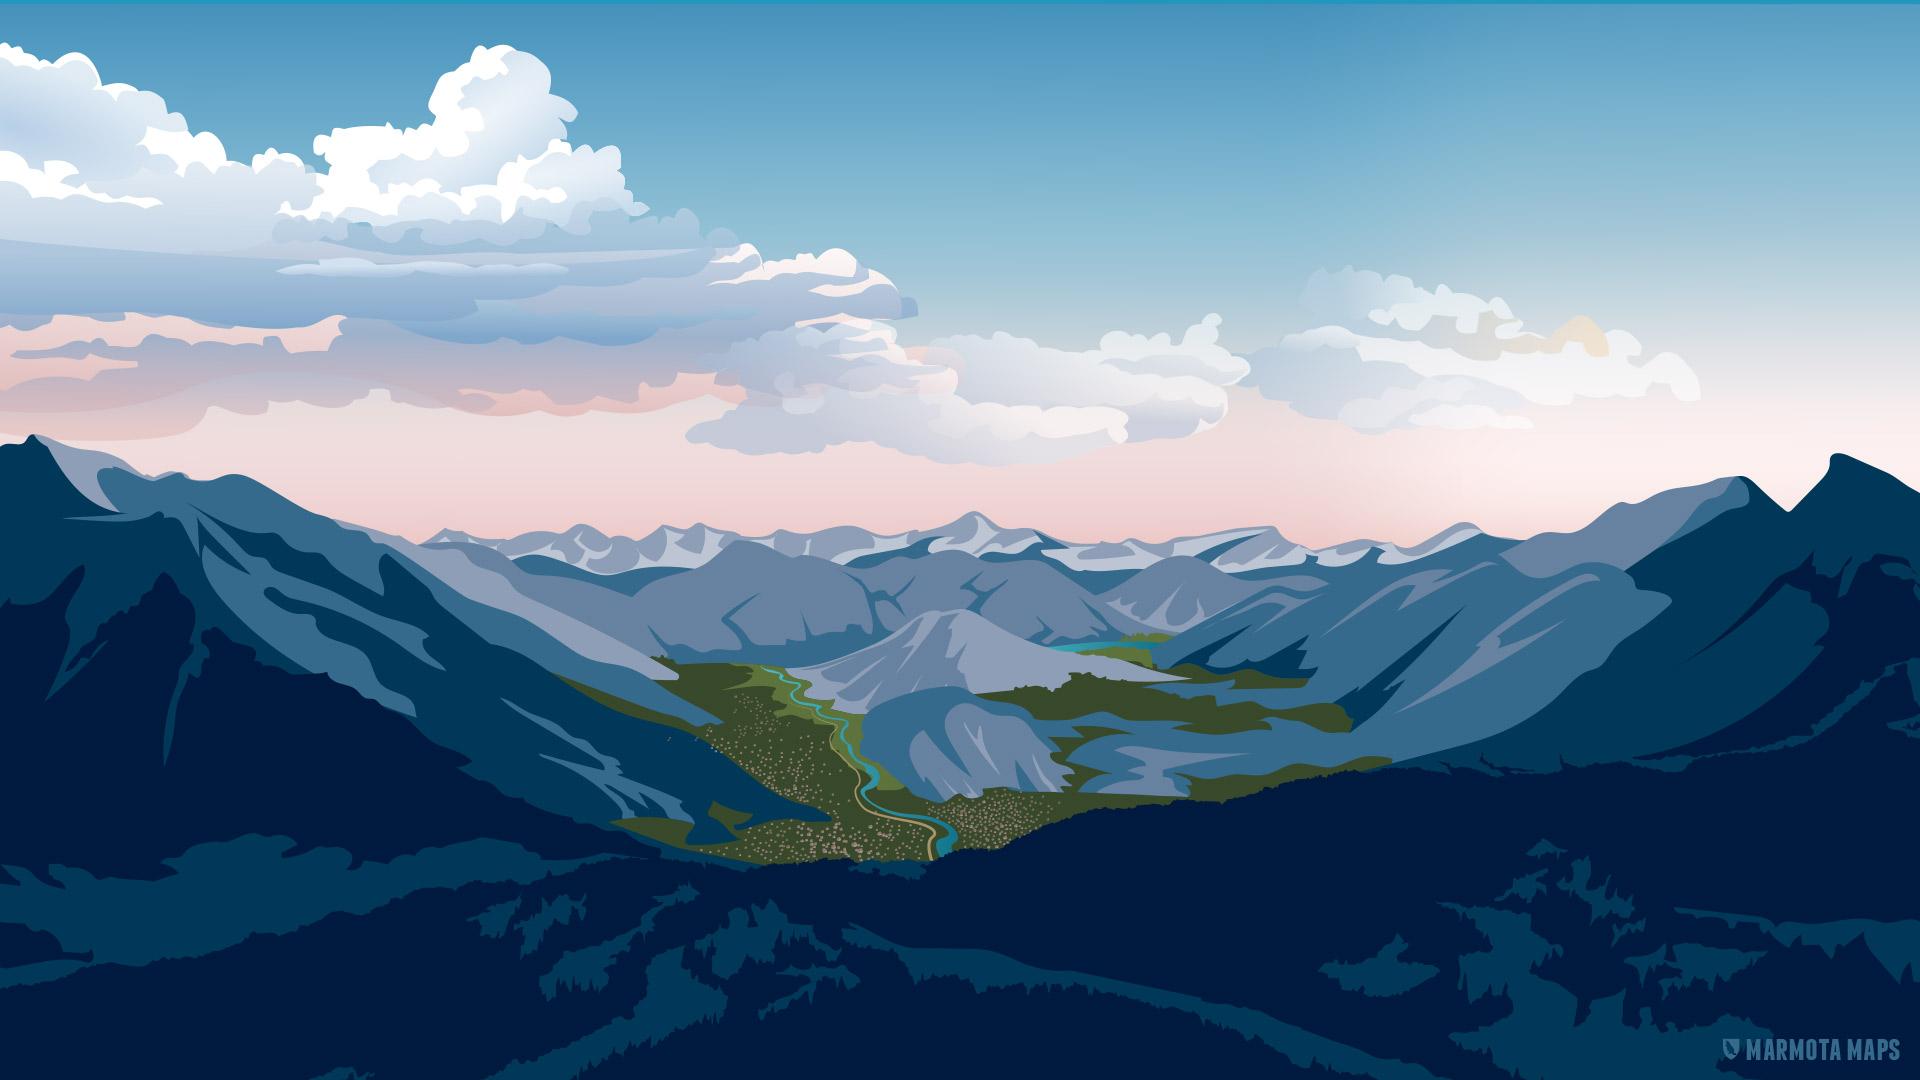 Wallpaper fürs Smartphone   Marmota Maps